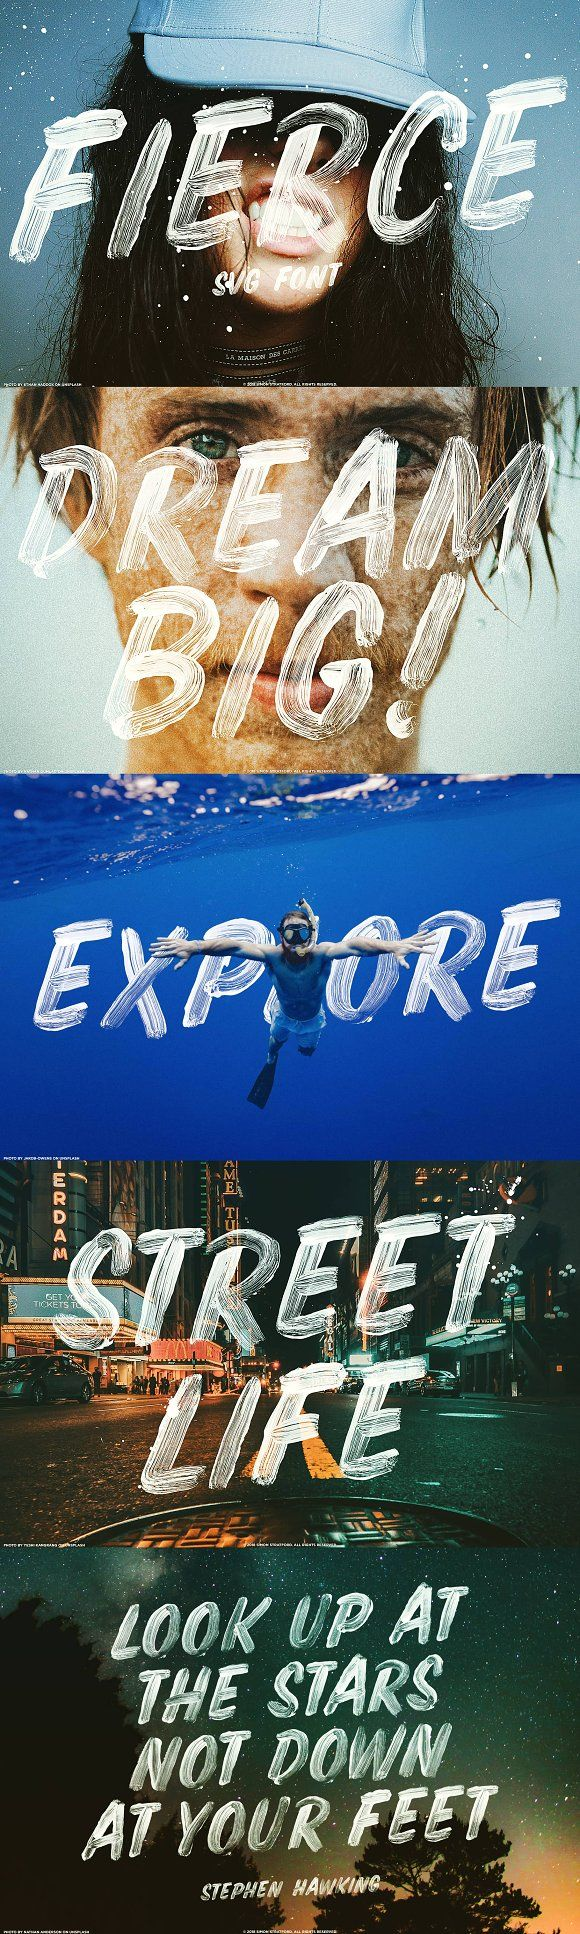 Display Fierce font SVG brush script font colour font